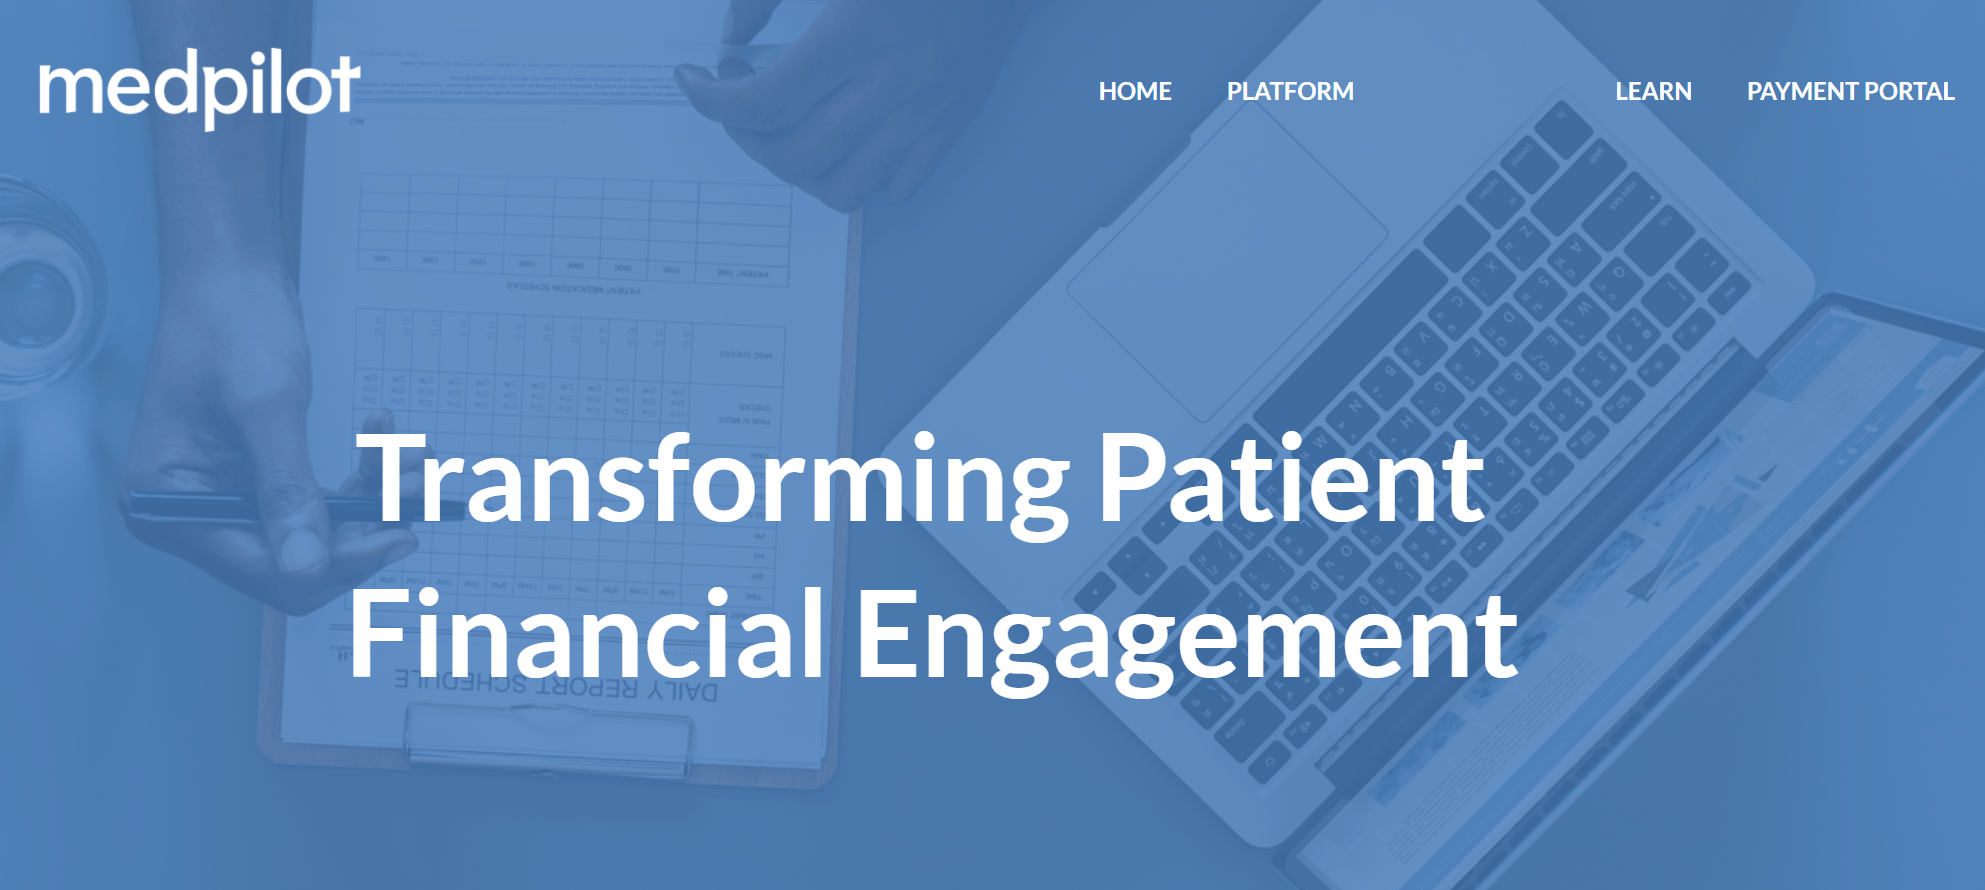 Revenue Cycle Startup Medpilot Nabs $1.7M to Expand Patient Financial Engagement Platform